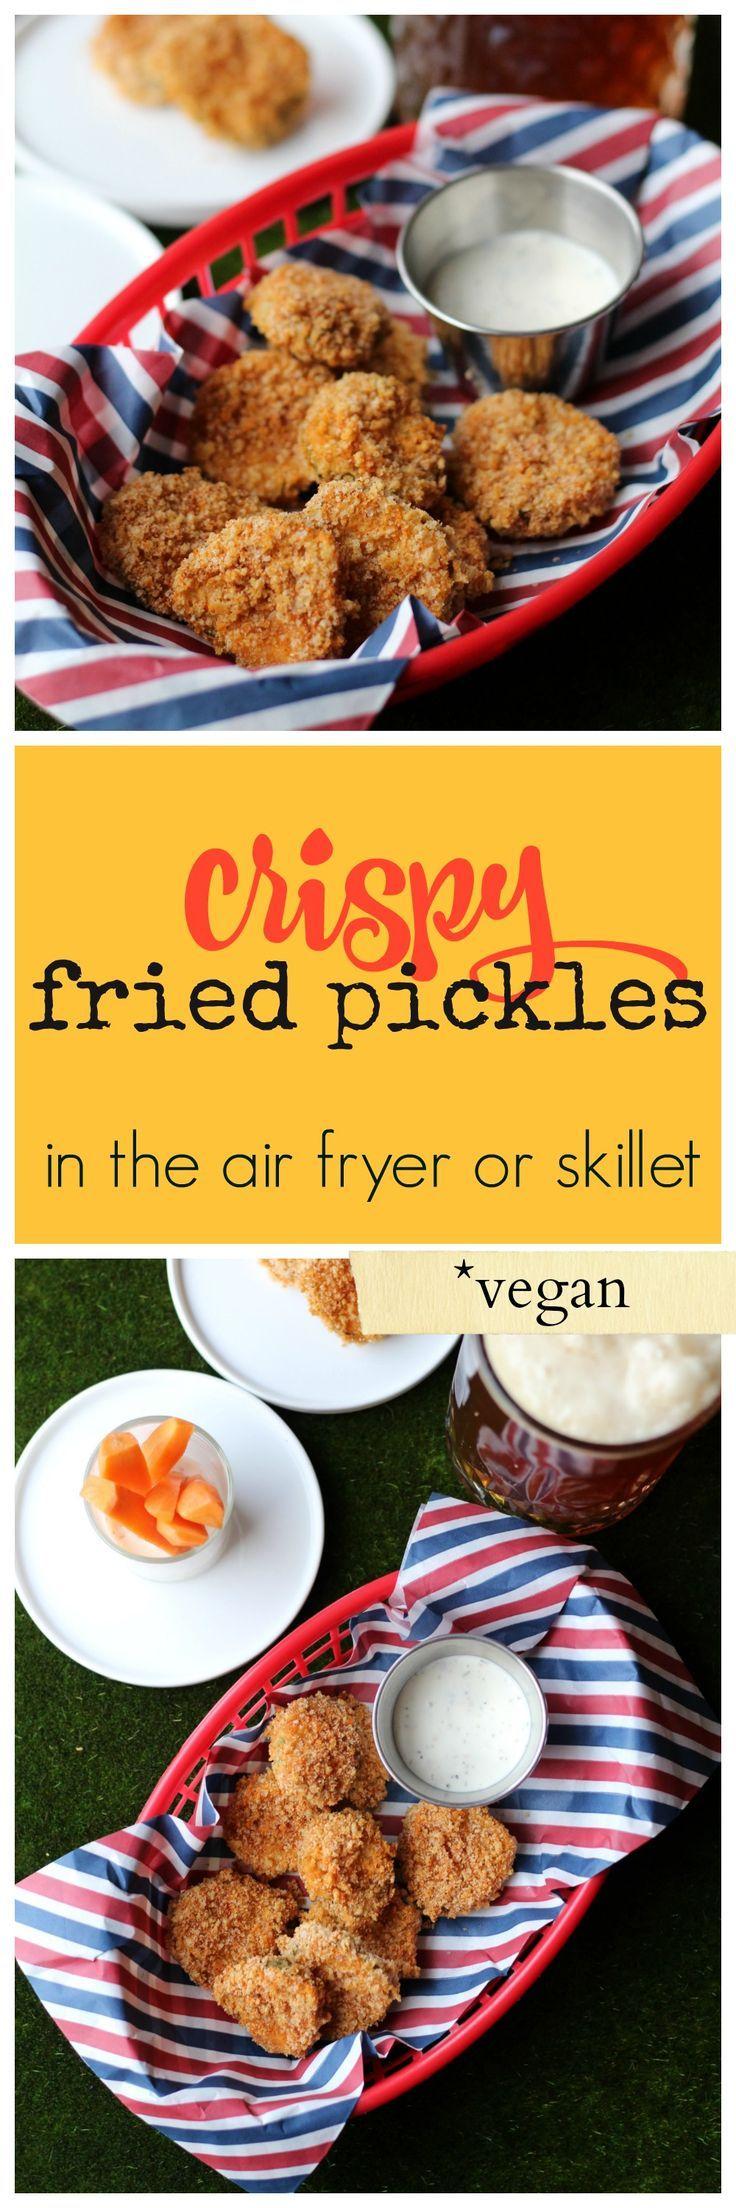 Crispy fried pickles Recipe Air fryer recipes, Food